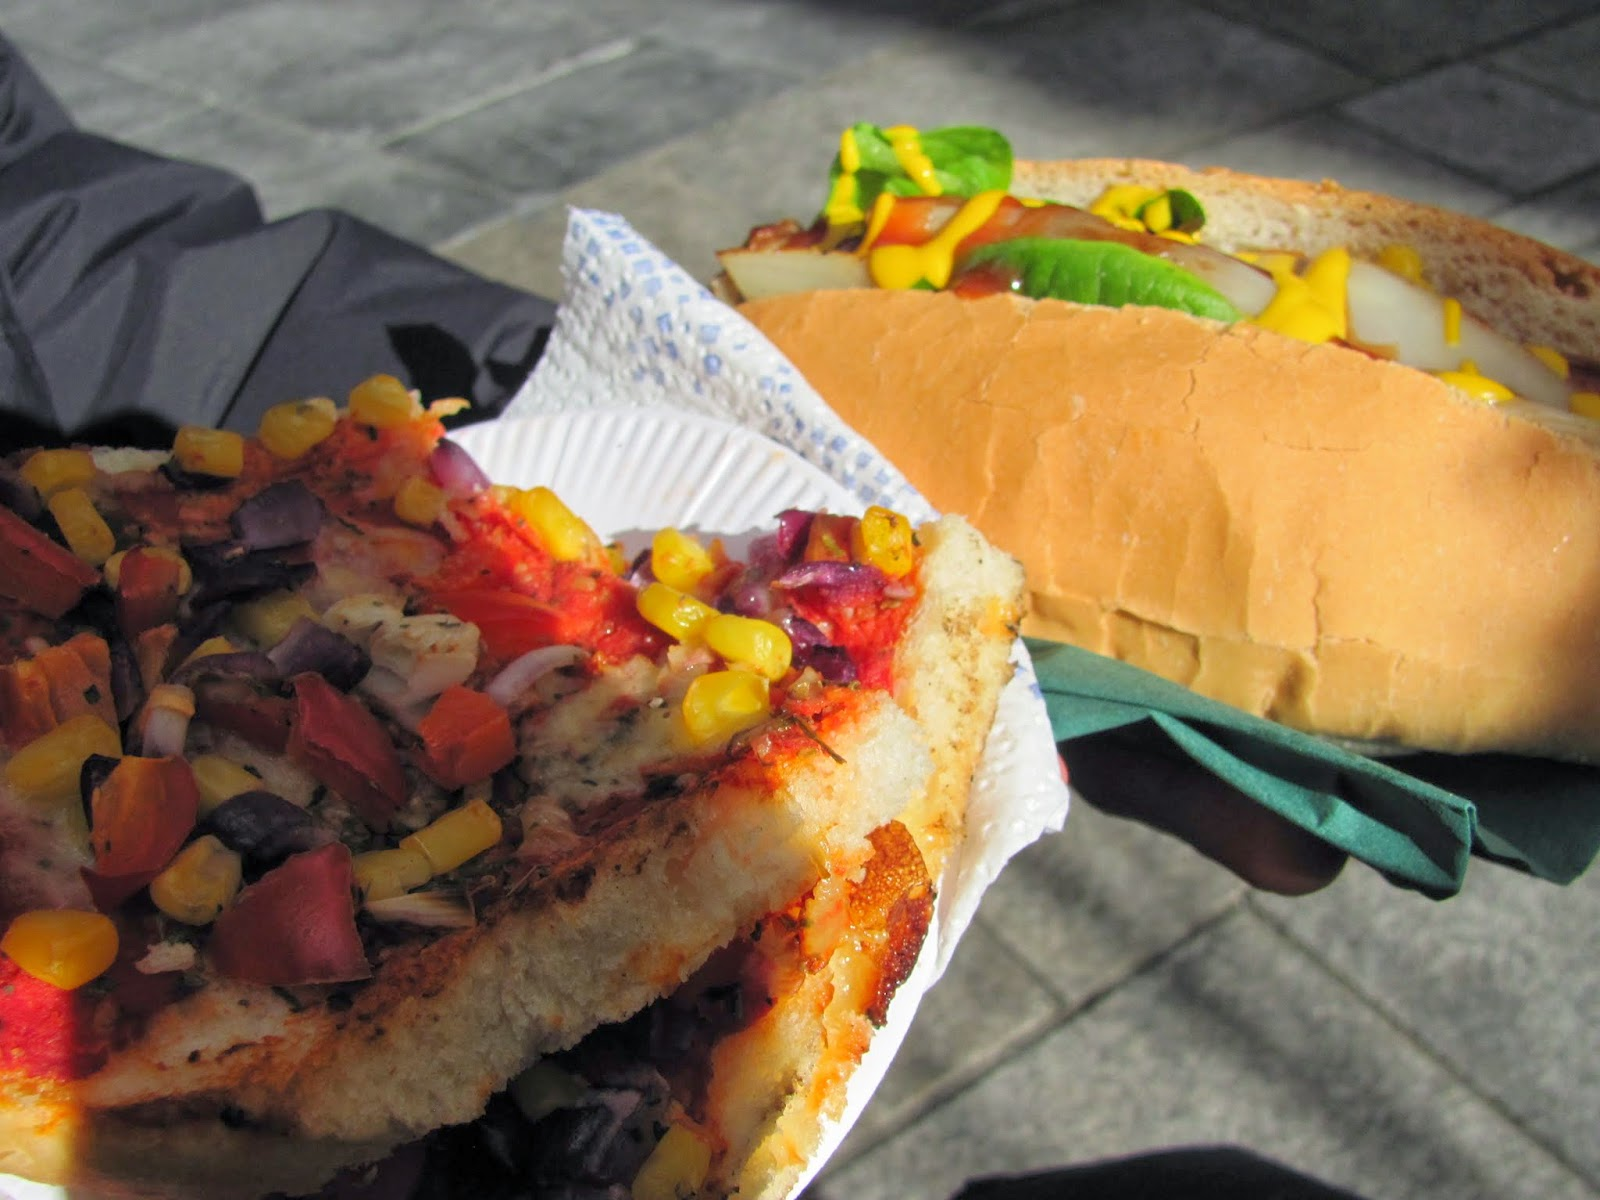 Bruschetta and Venison Bratwurst Temple Bar Food Market Dublin, Ireland